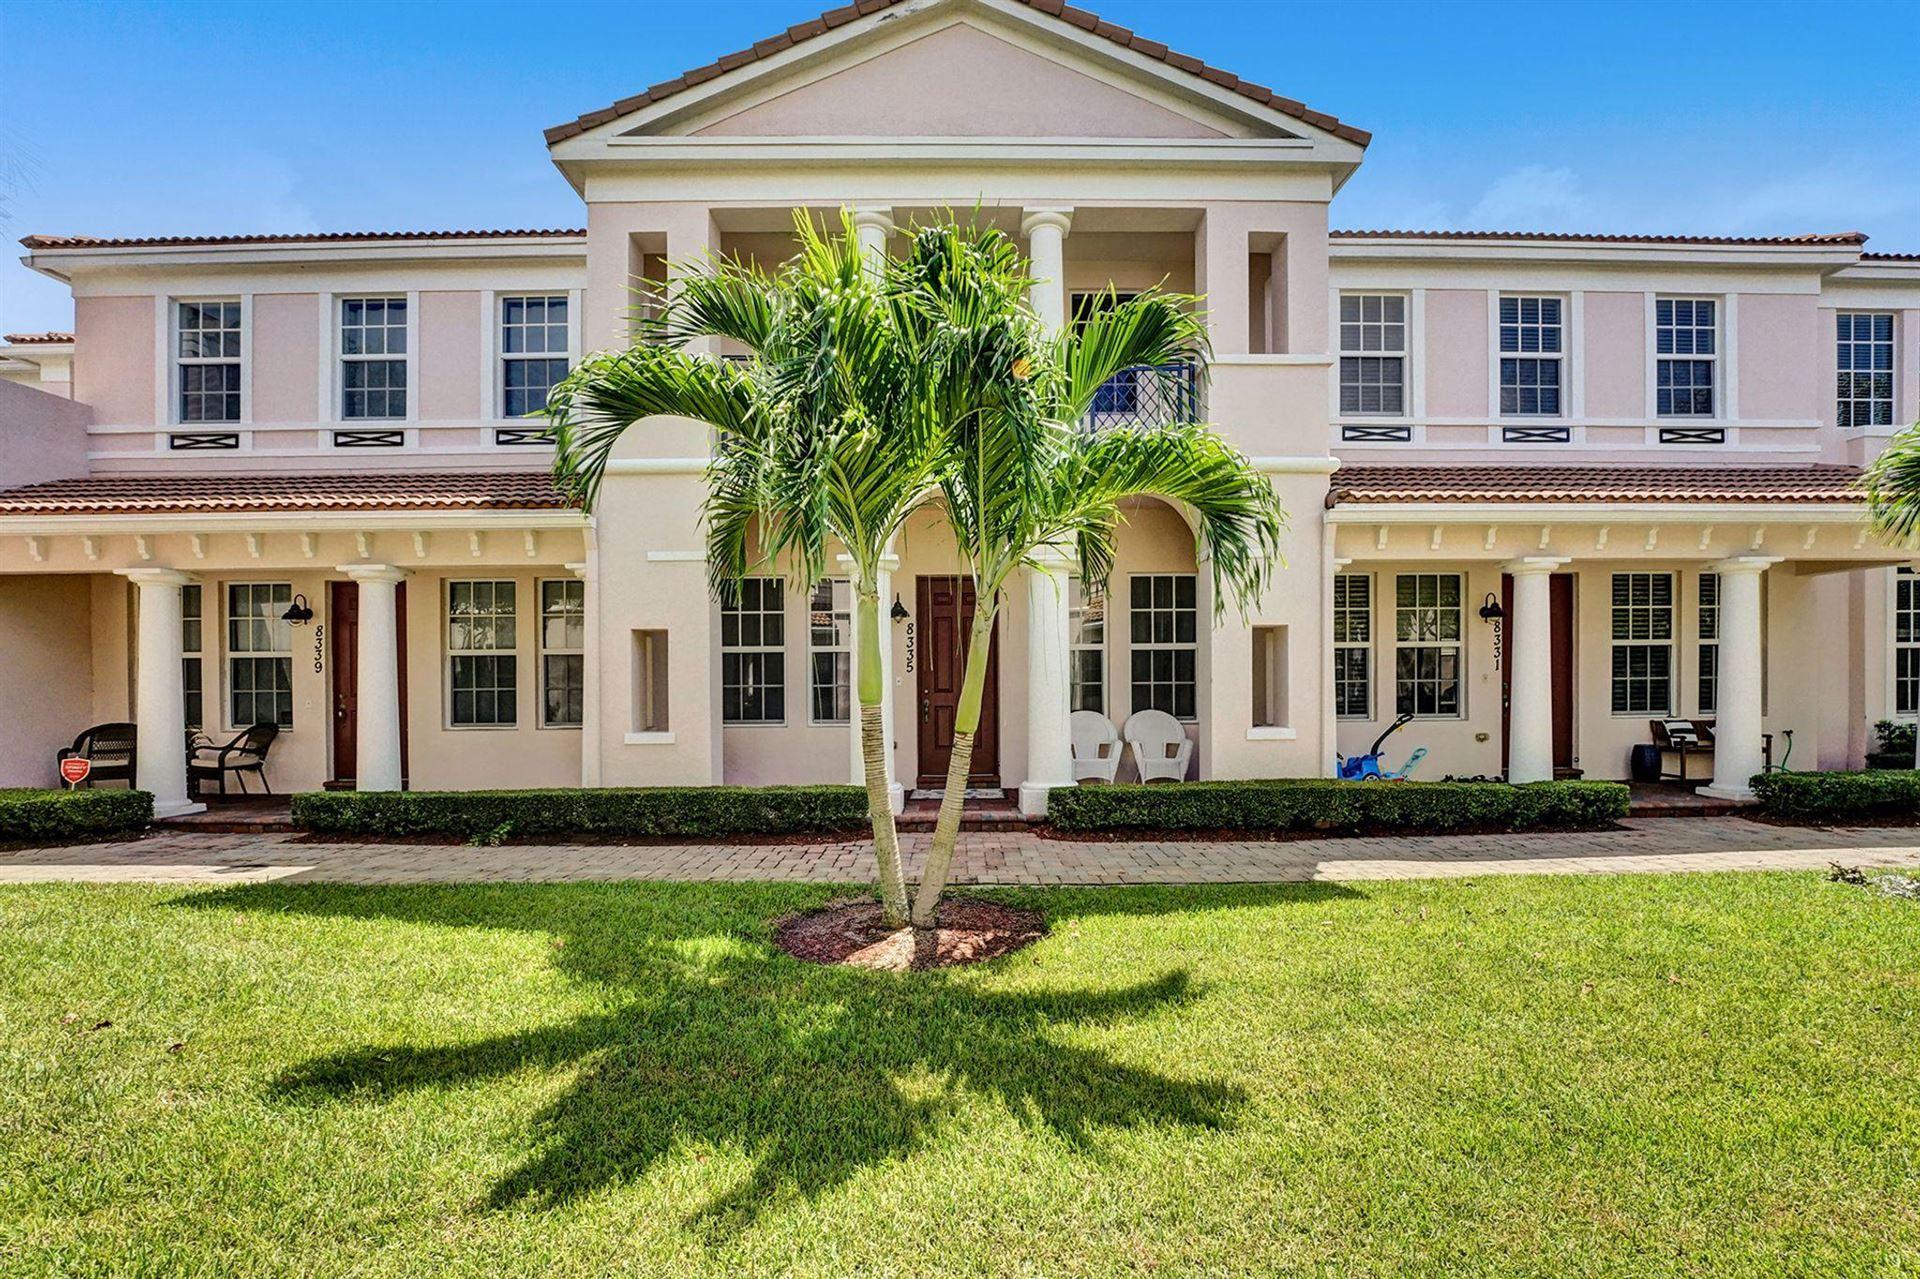 8335 NW 8th Terrace, Boca Raton, FL 33487 - #: RX-10647022